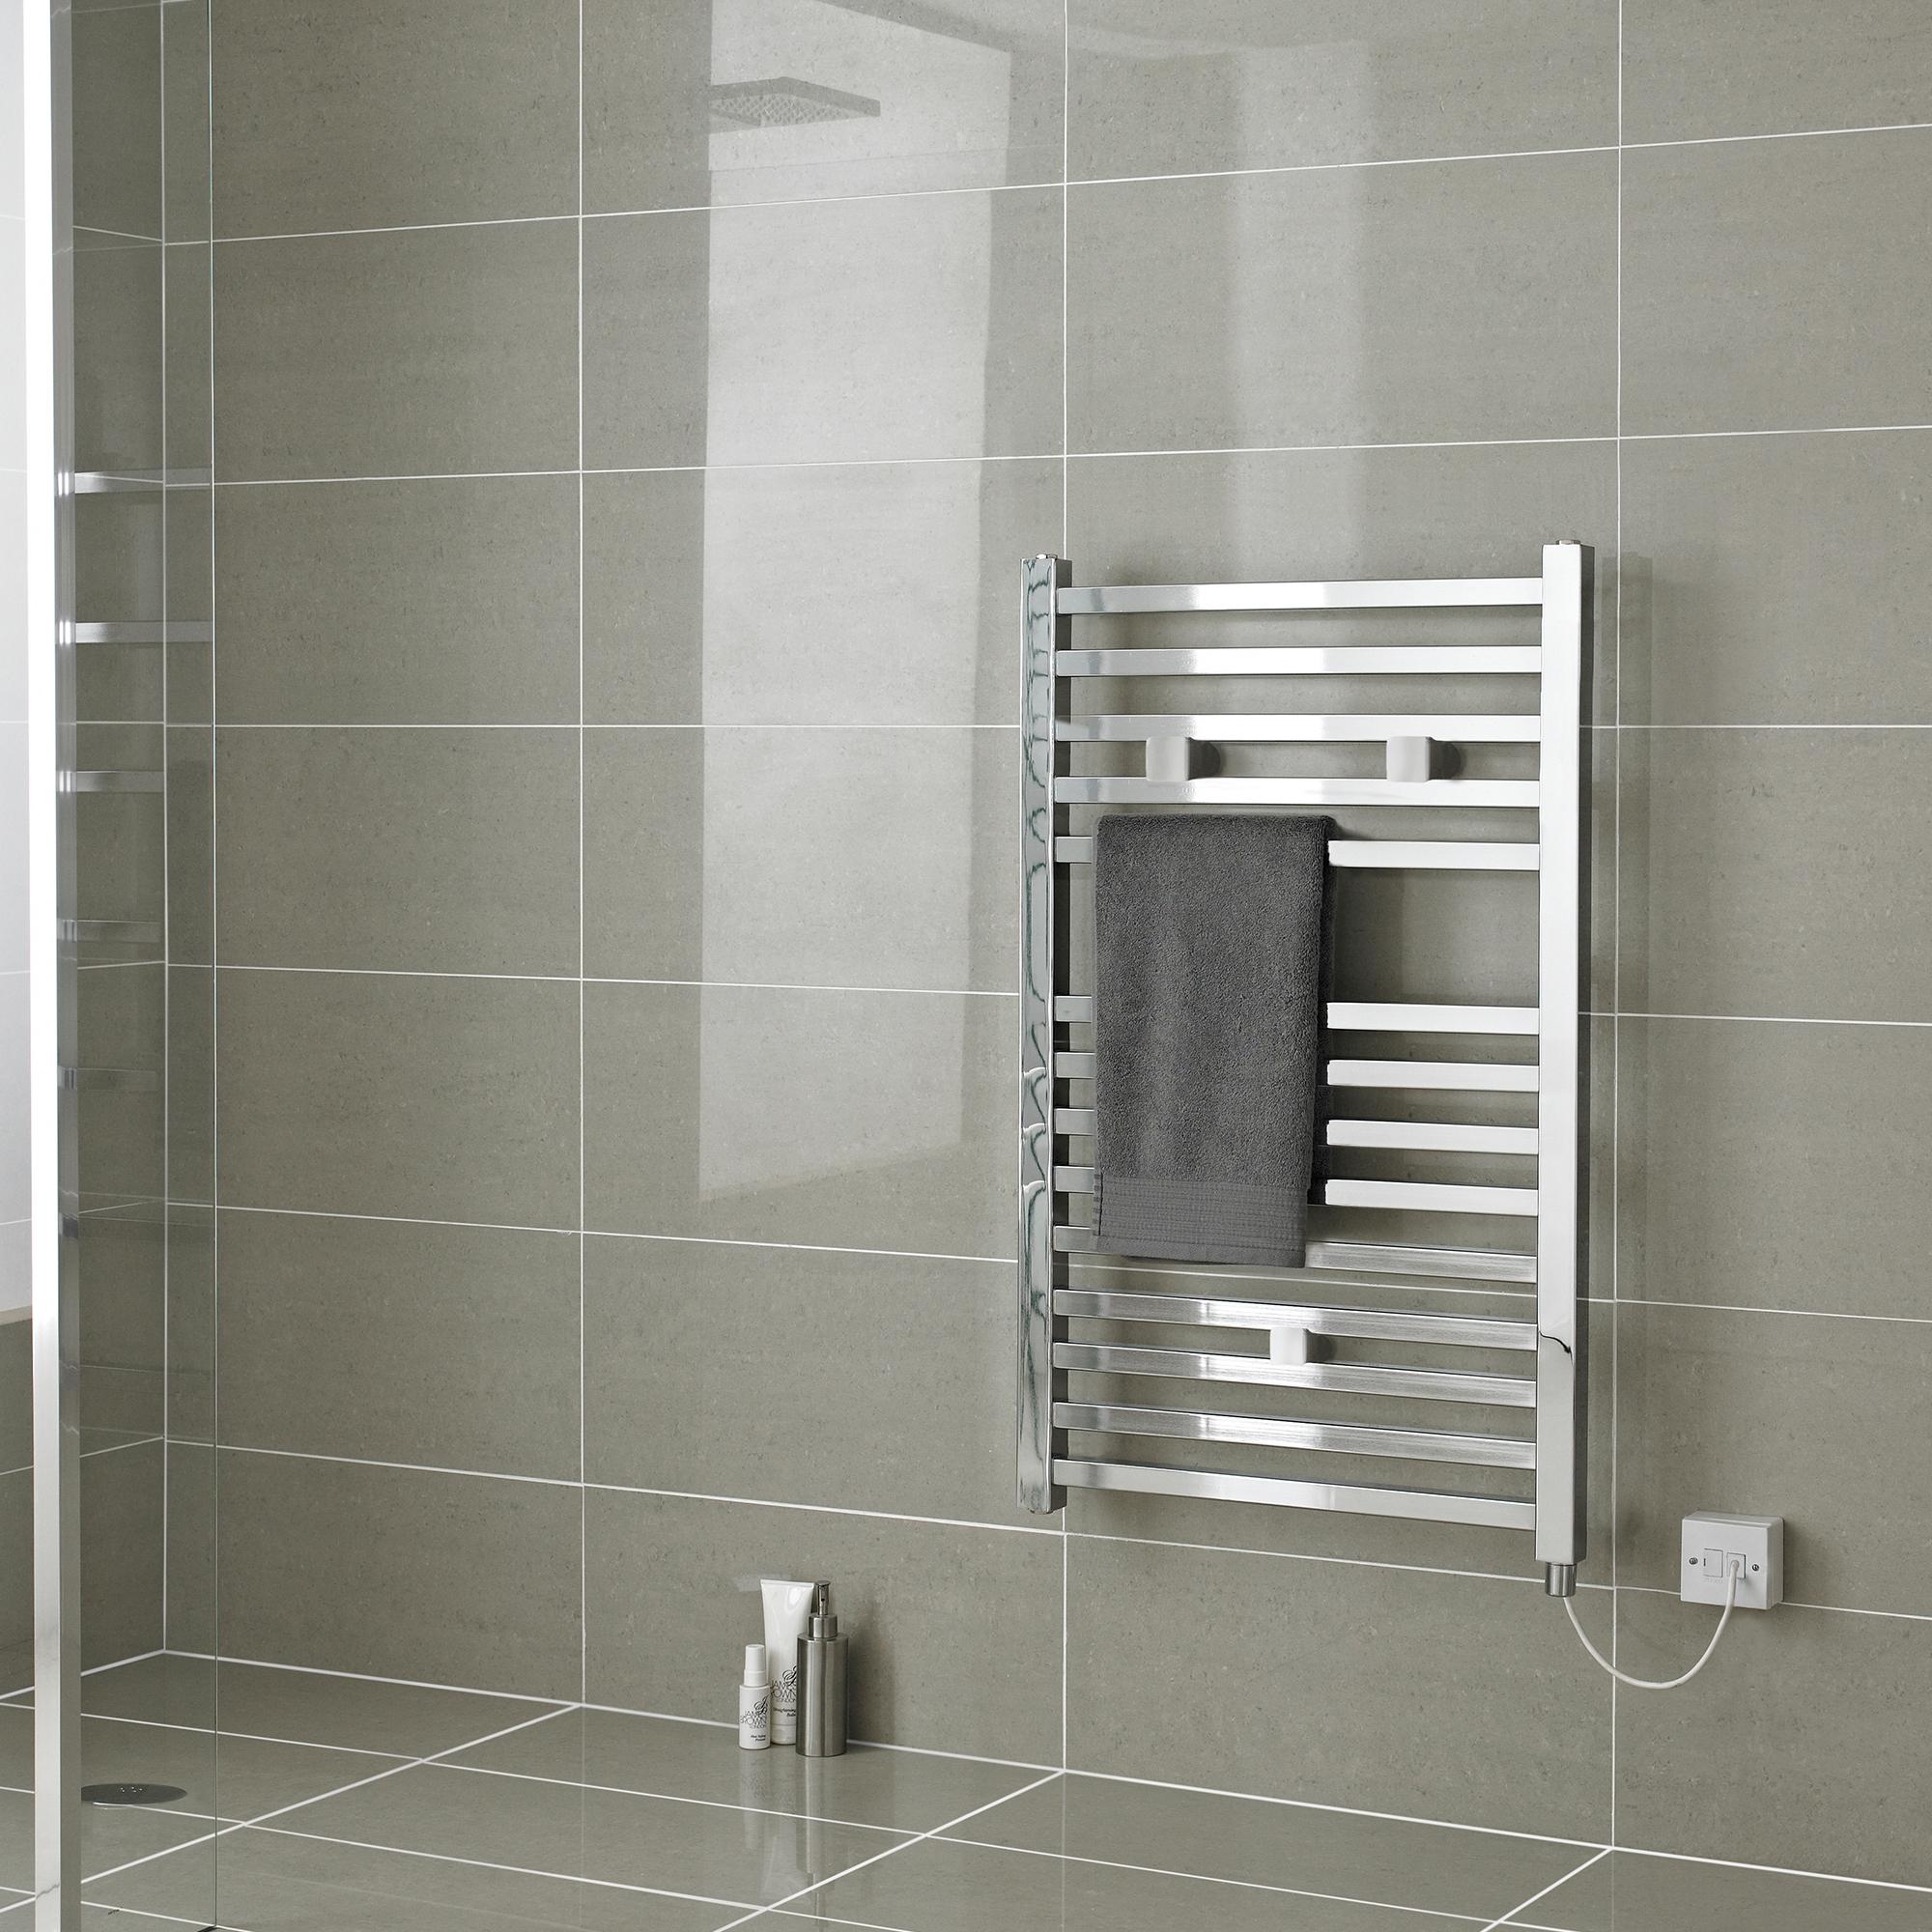 Hudson Reed Eton Electric Heated Towel Rail 690mm H x 500mm W - Chrome